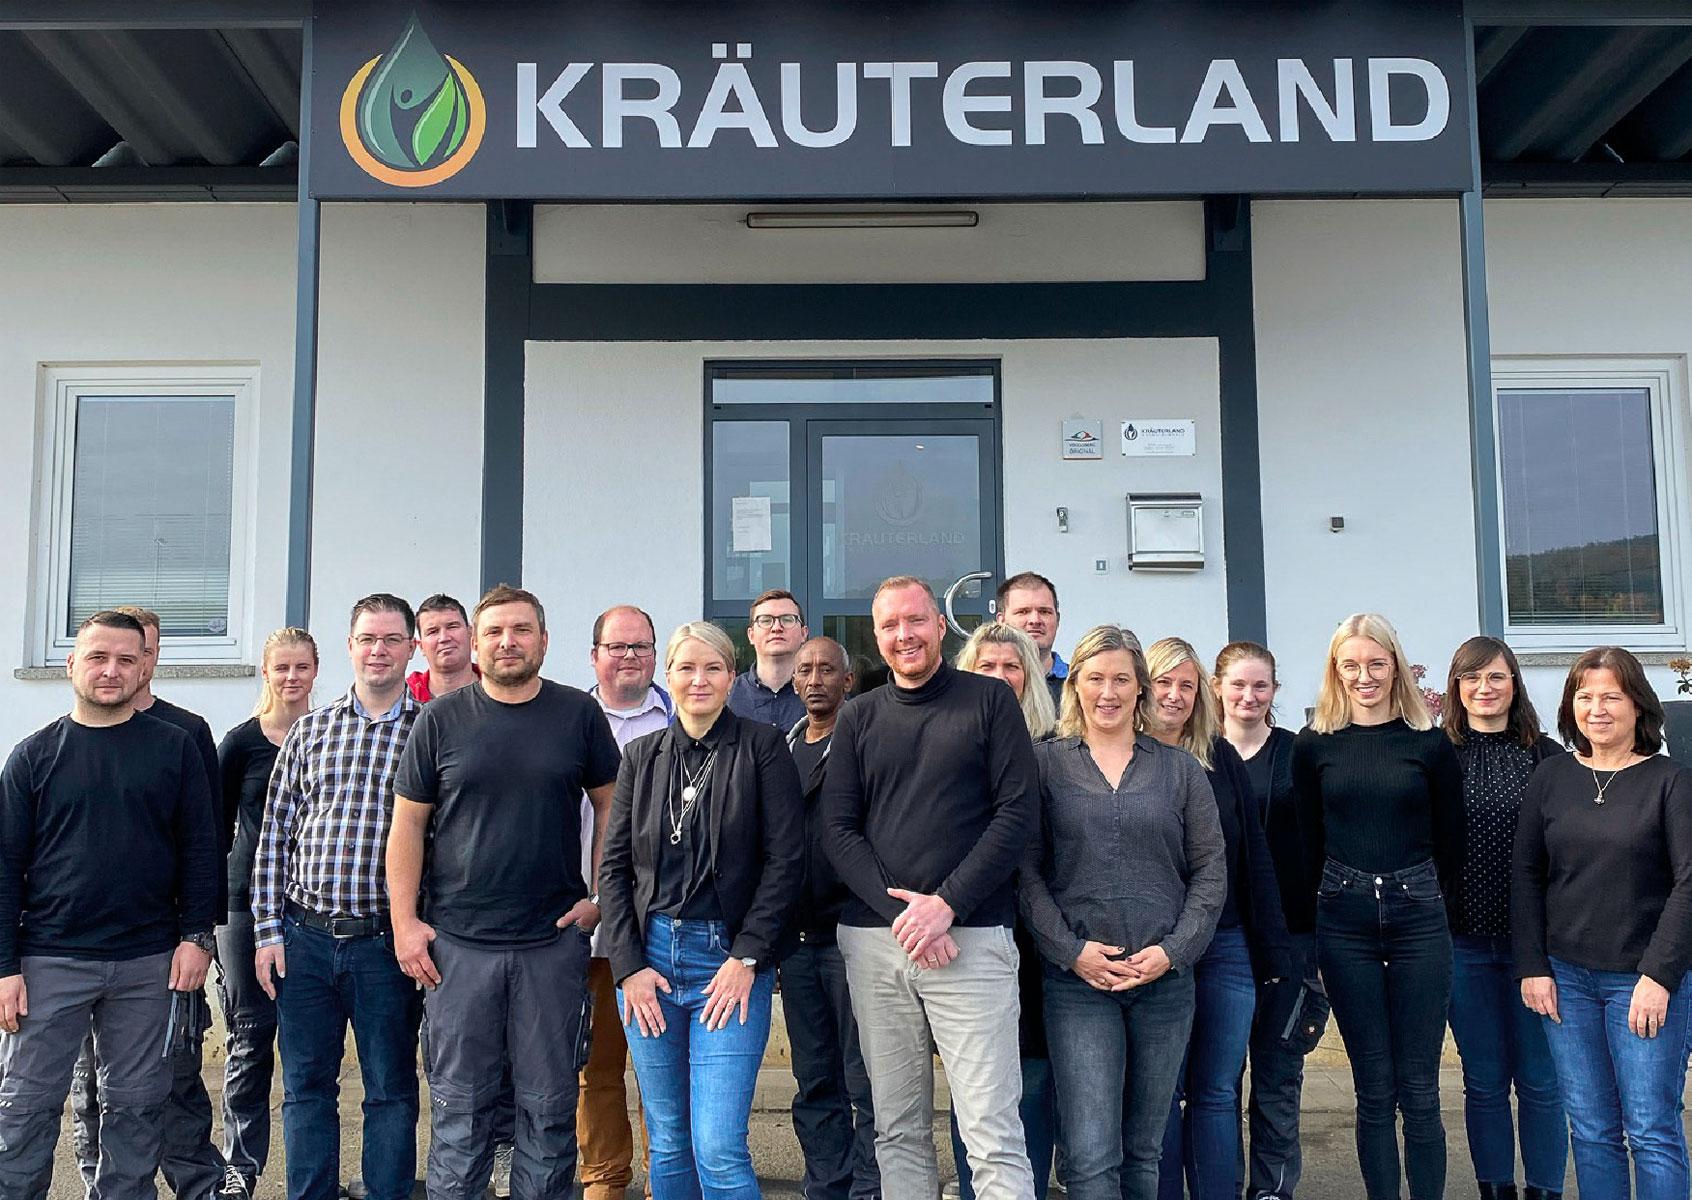 Team Kräuterland